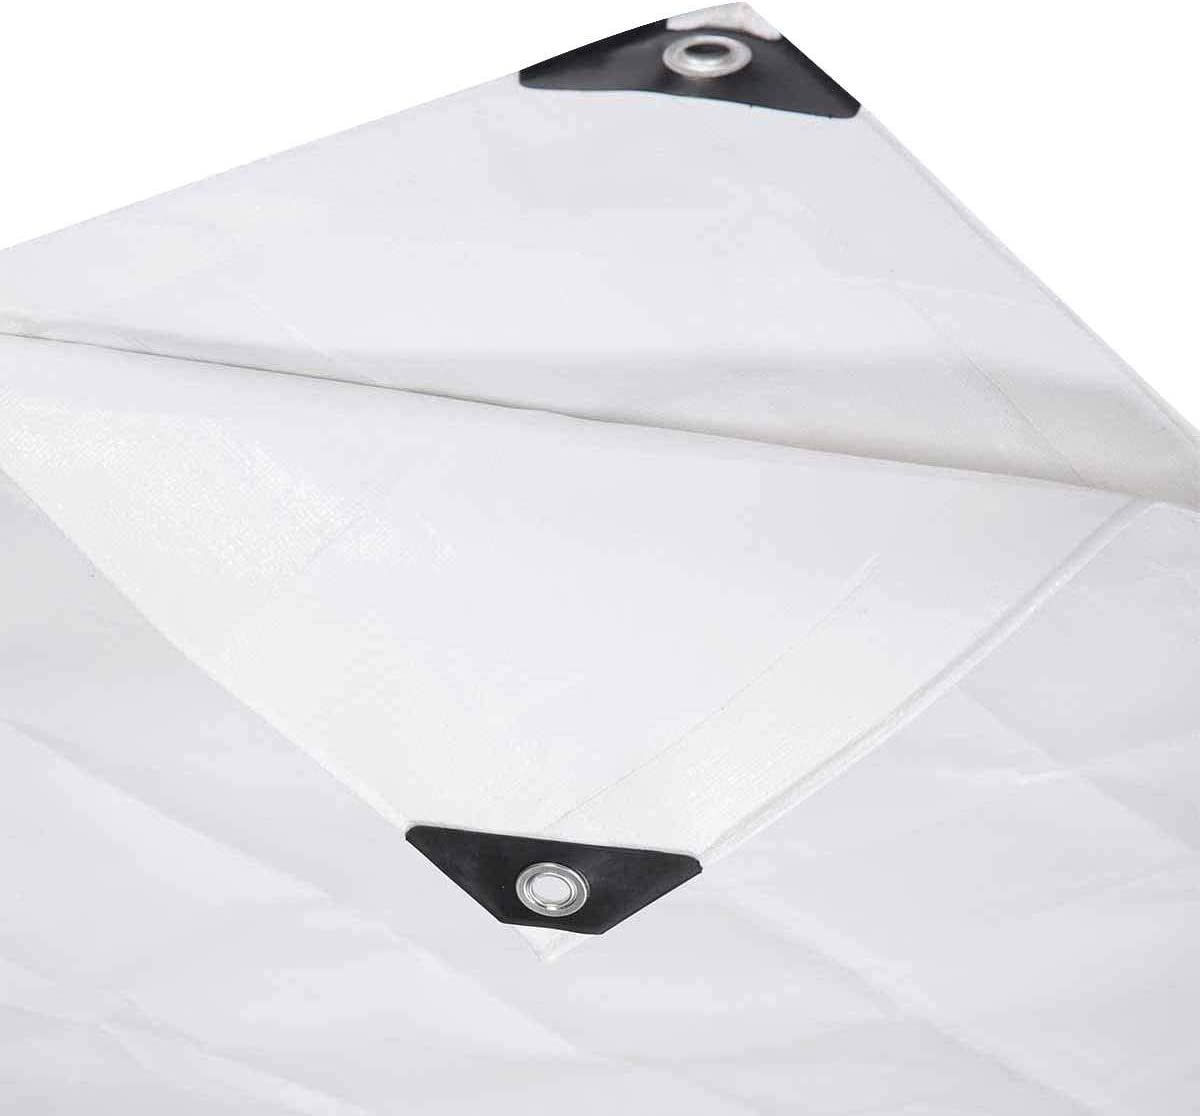 Lestarain Lona Impermeable Universal y Duradera de Lona con Ojales para Muebles, jard/ín ,Coche ect 280g//m2 Blanco 1.5X10M